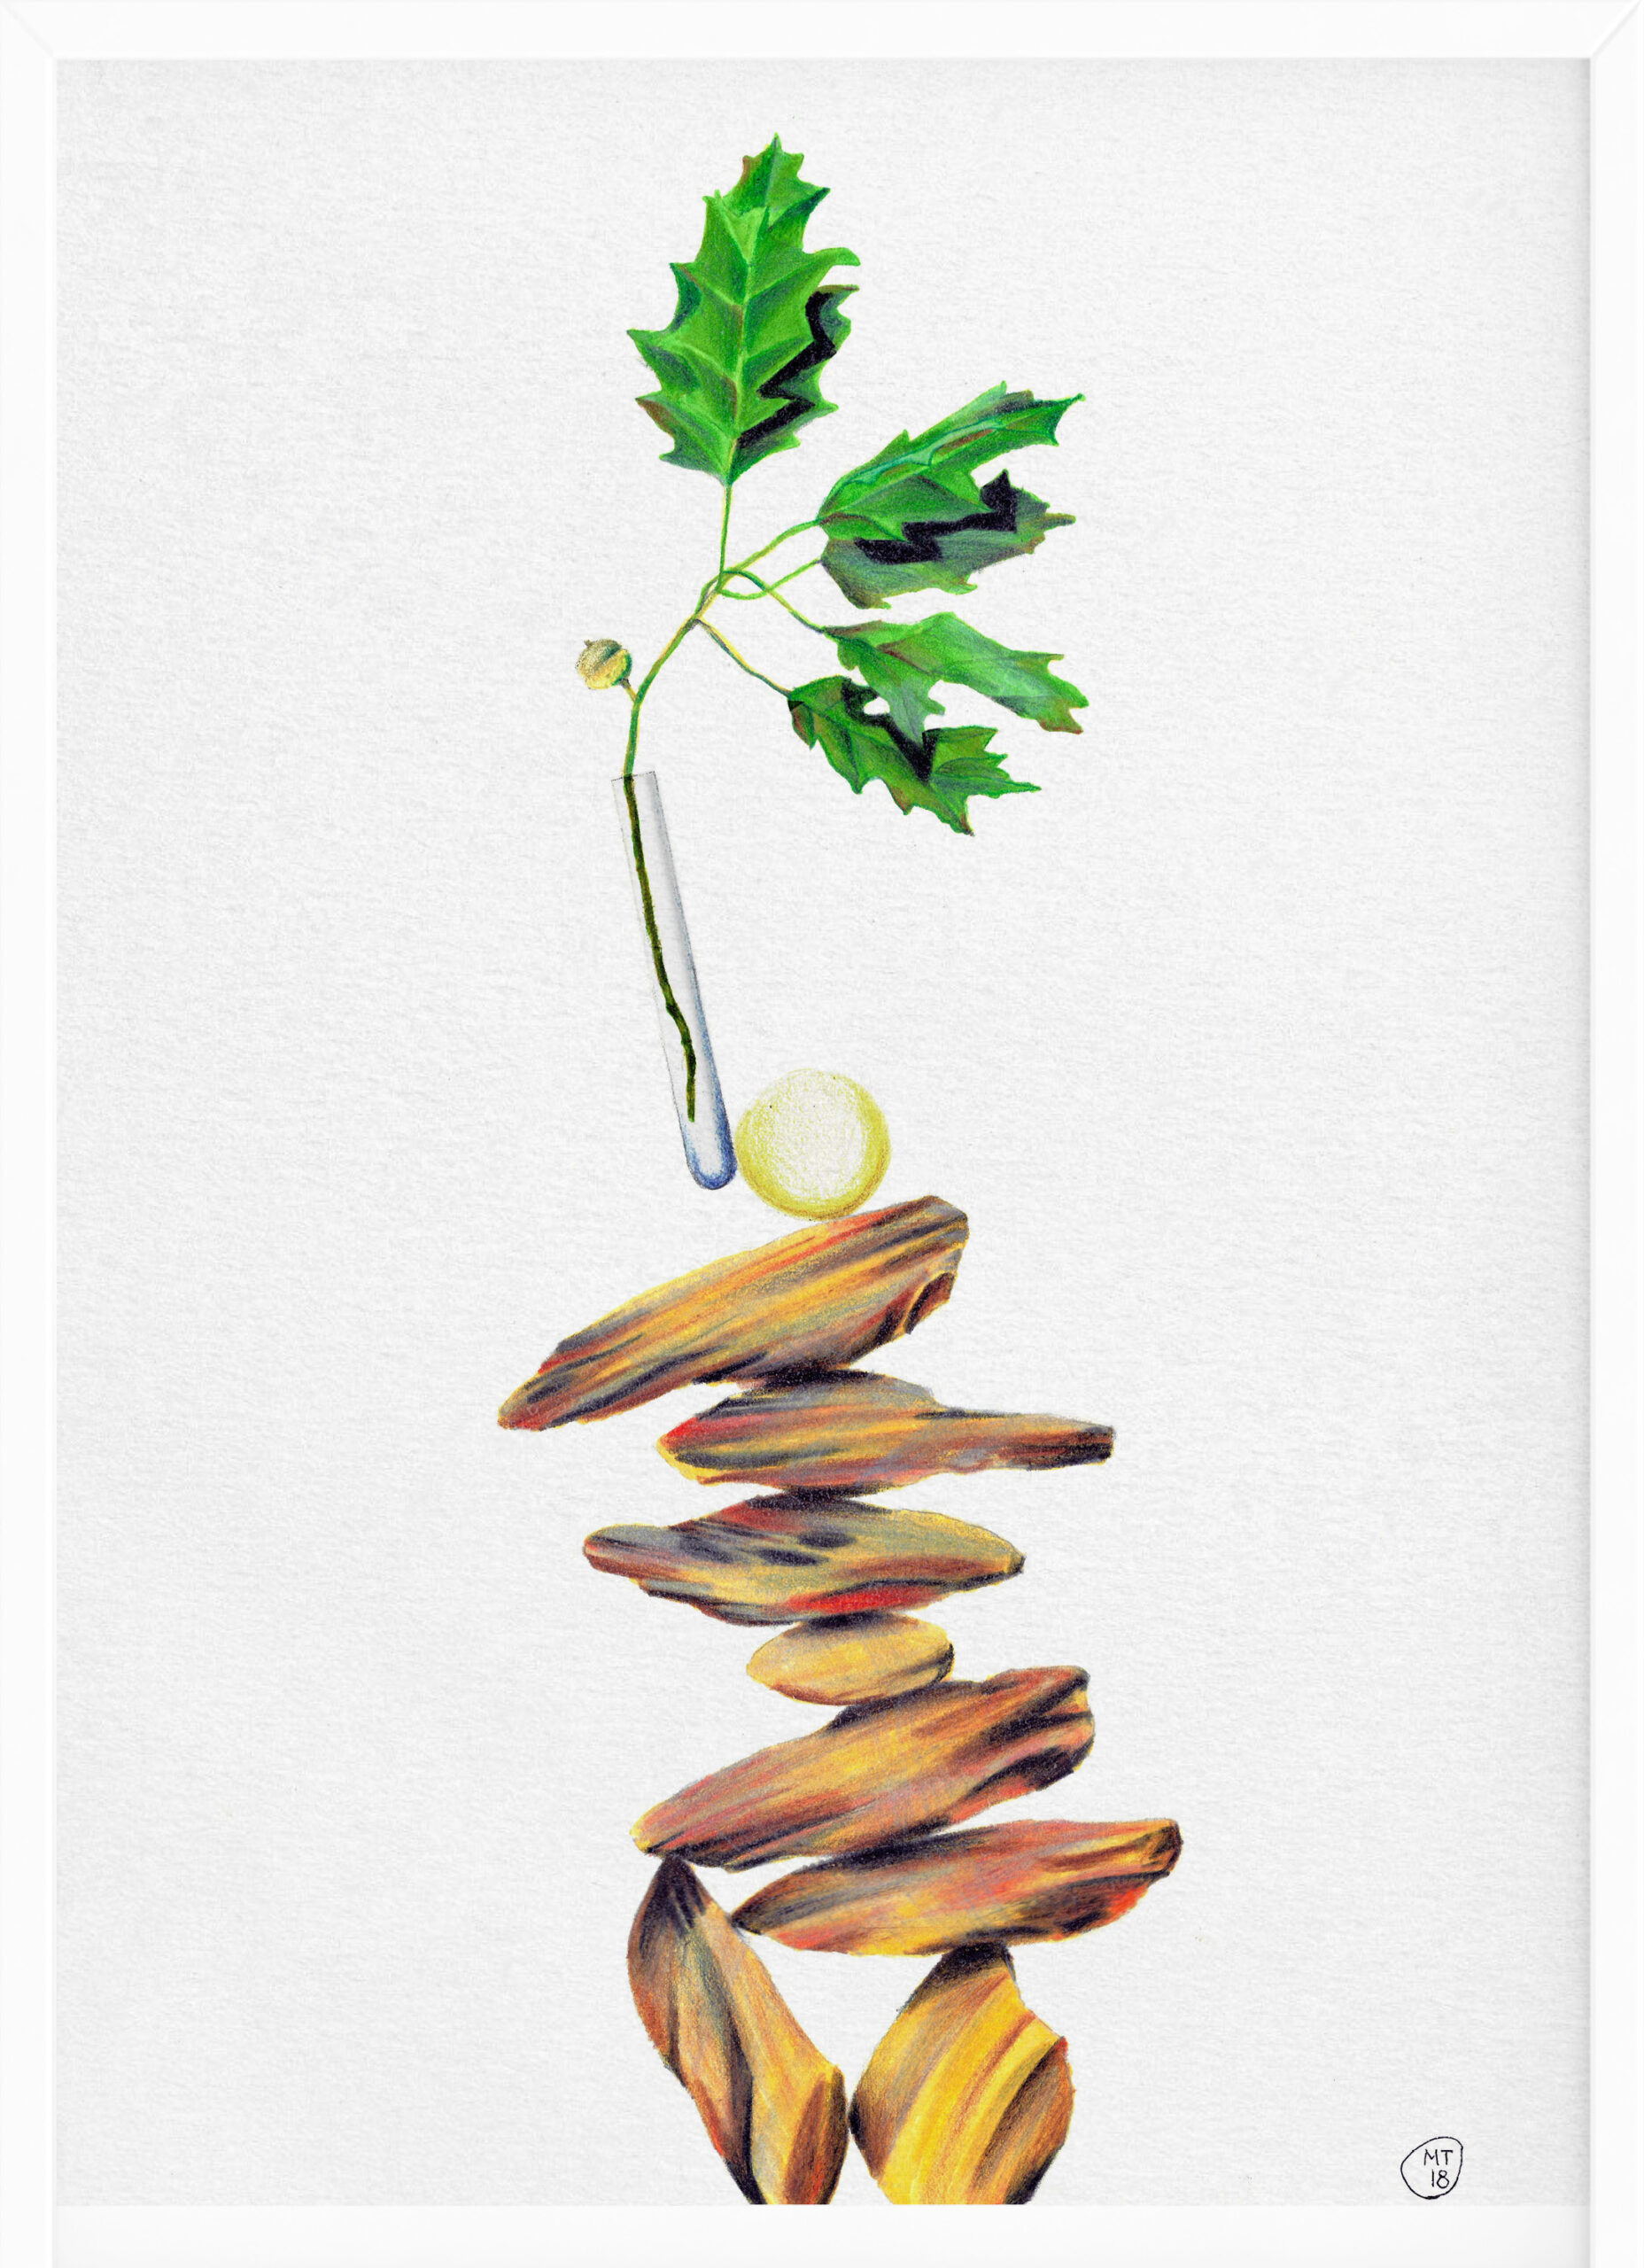 Caos | Drawings | Mario Trimarchi Design6